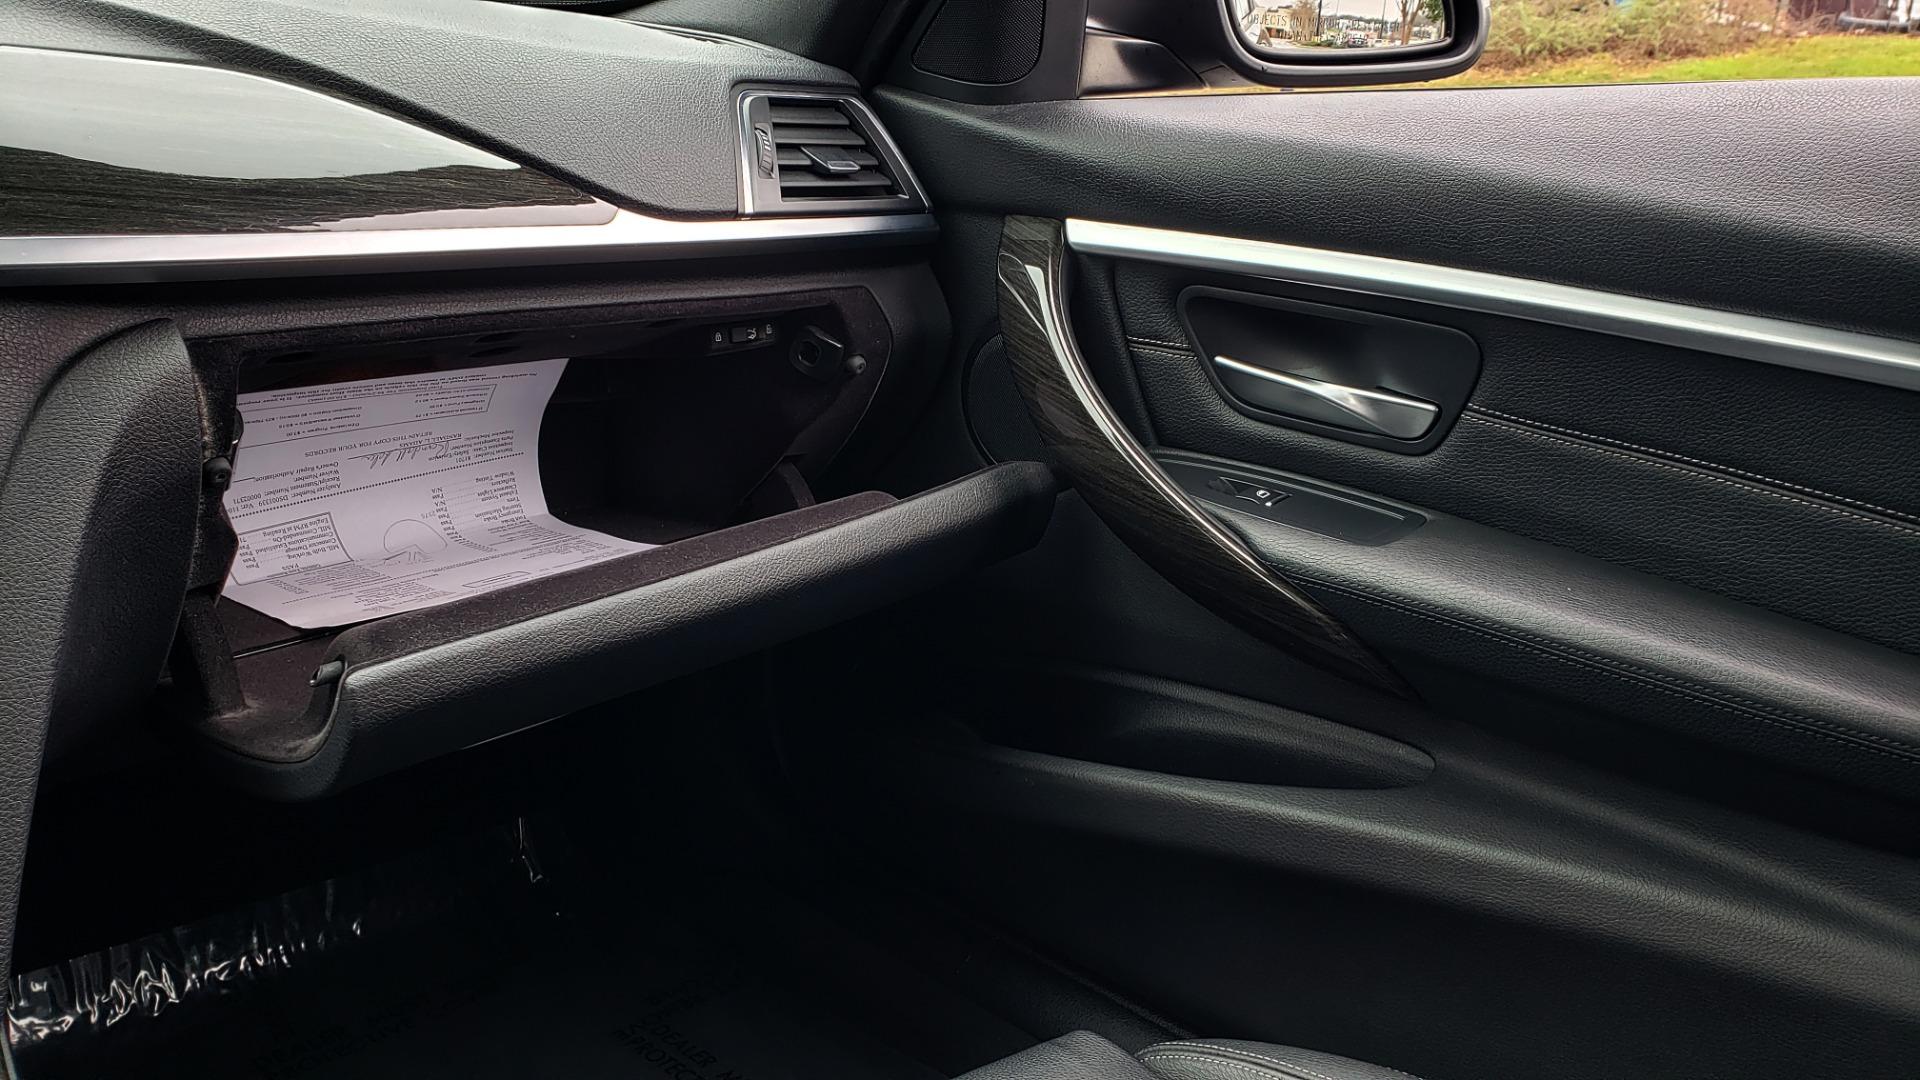 Used 2016 BMW 3 SERIES 328I PREMIUM PKG / DRVR ASST / SUNROOF / PARK ASST for sale Sold at Formula Imports in Charlotte NC 28227 47